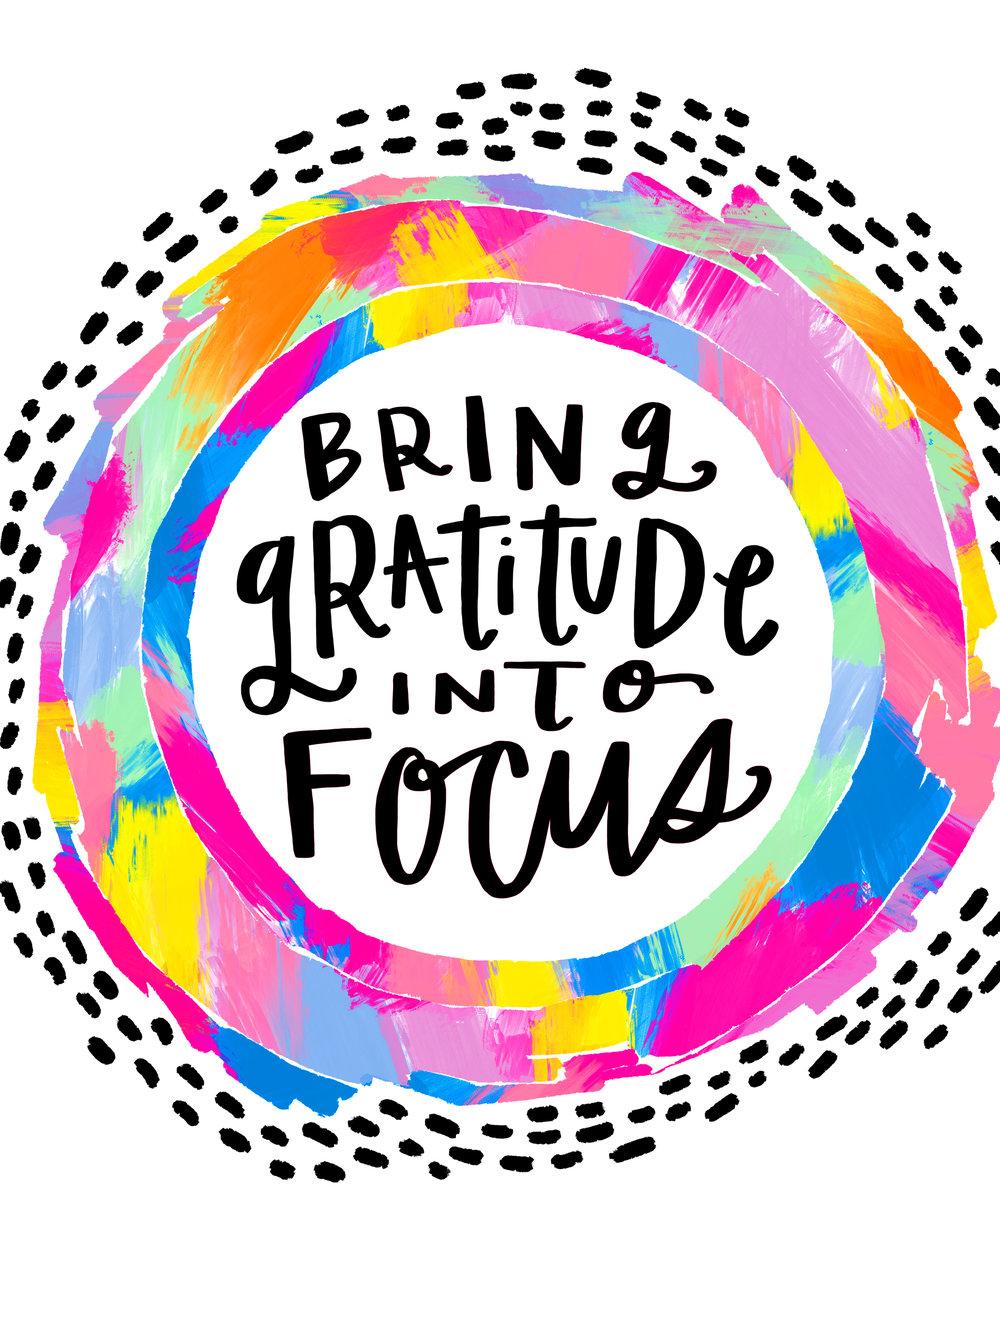 5/8/16: Gratitude